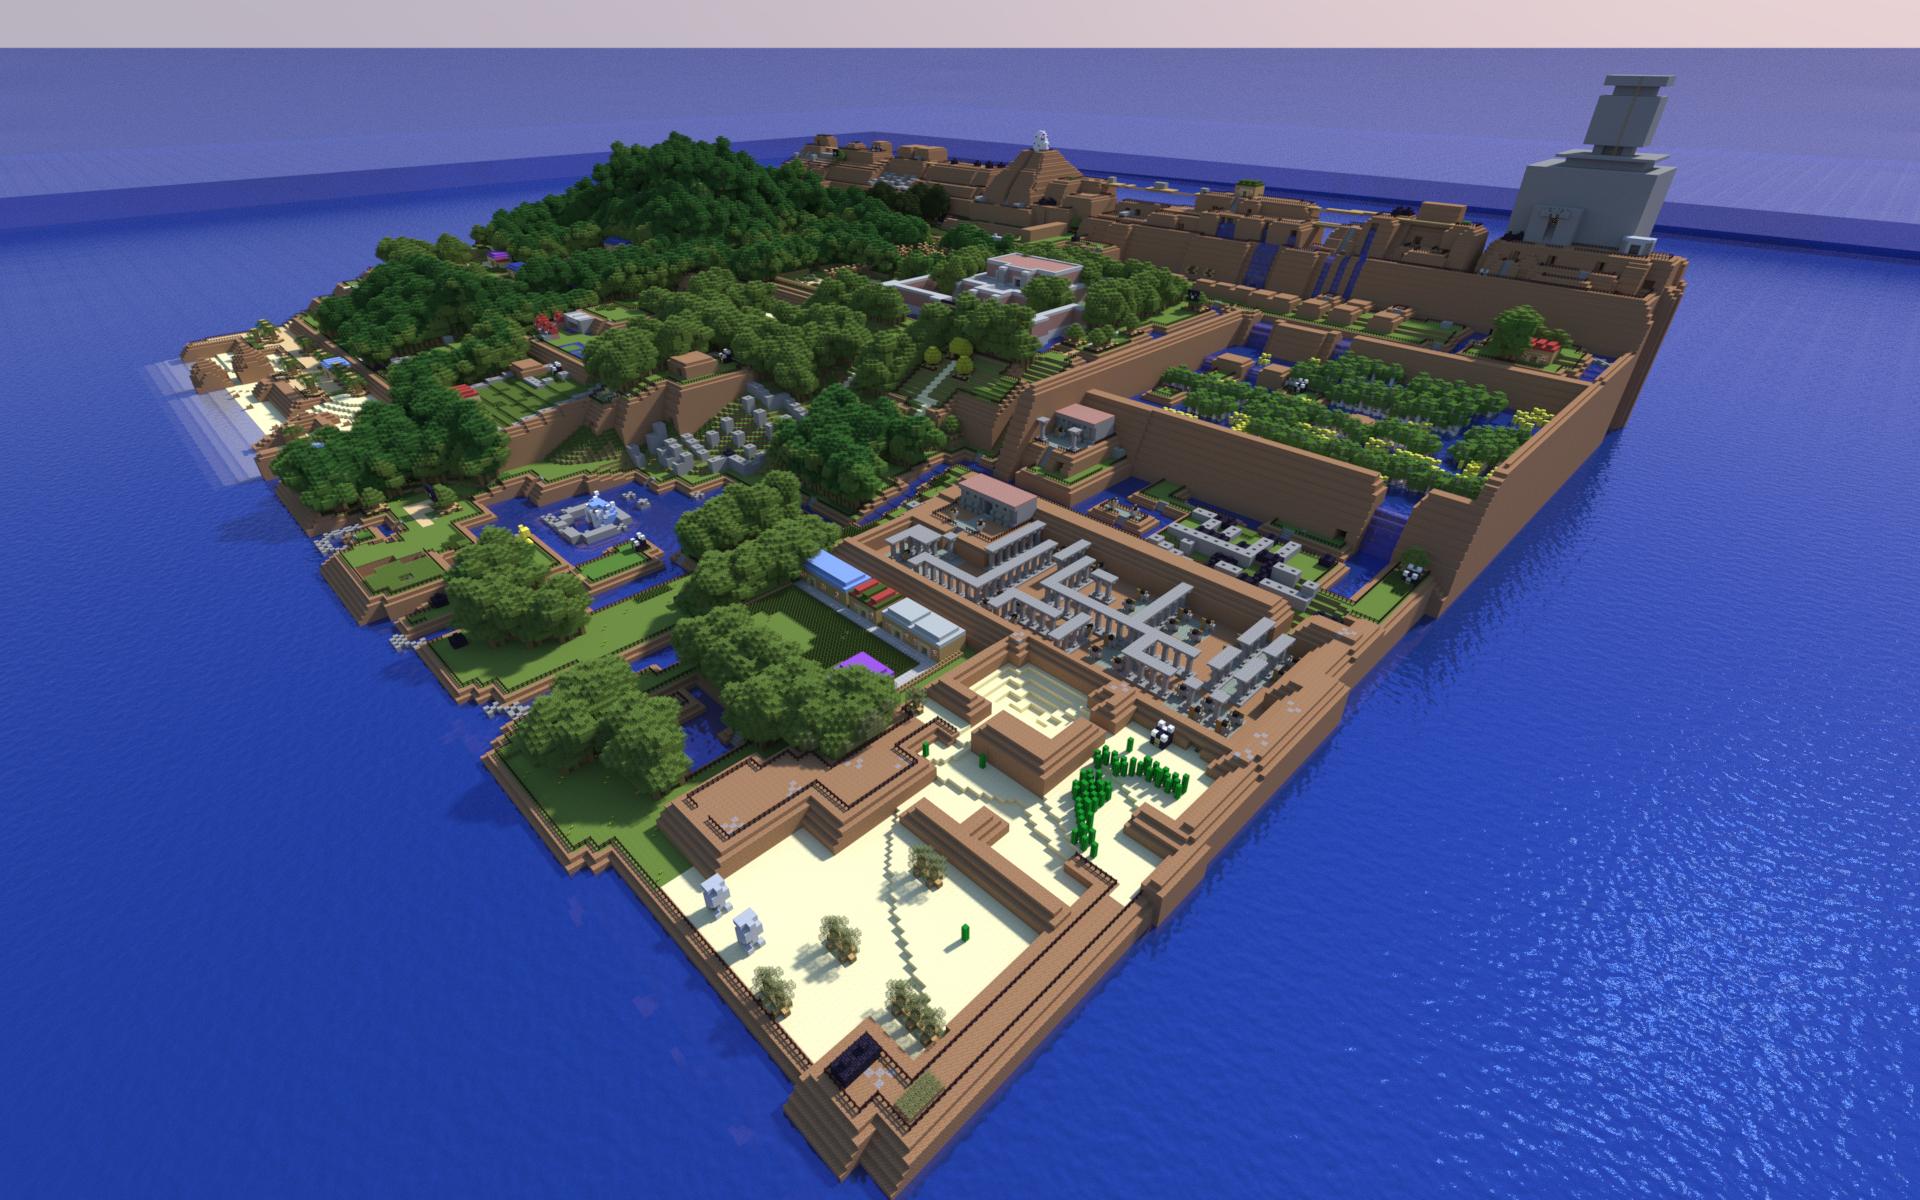 Futuro House Floor Plan The Legend Of Zelda Minecraft S Awakening By Demium666 On